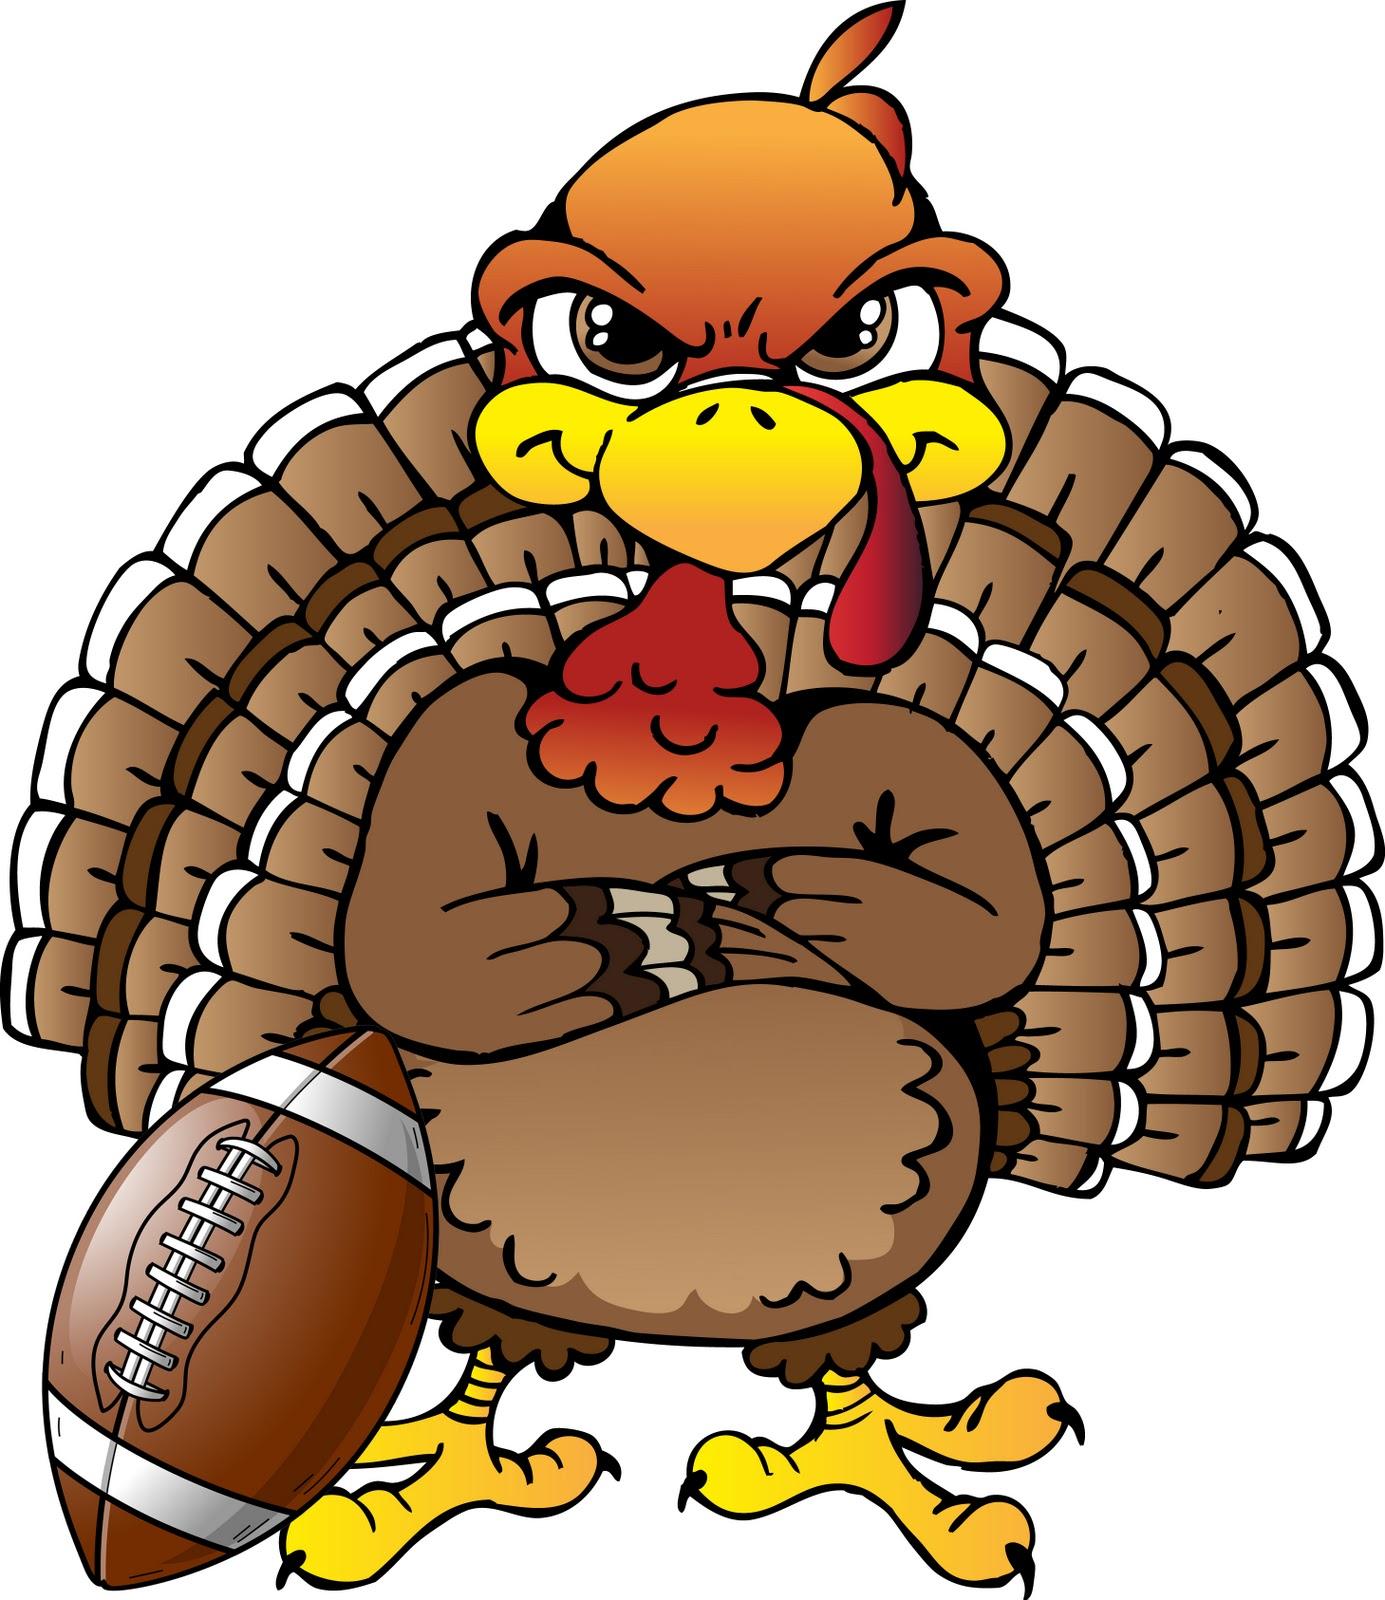 Funny Turkey Clip Art | Funny Thanksgivi-Funny Turkey Clip Art | Funny Thanksgiving Images, wallpaper, Funny Thanksgiving Images hd ... | Art | Pinterest | Very funny, Thanksgiving and Funny ...-10